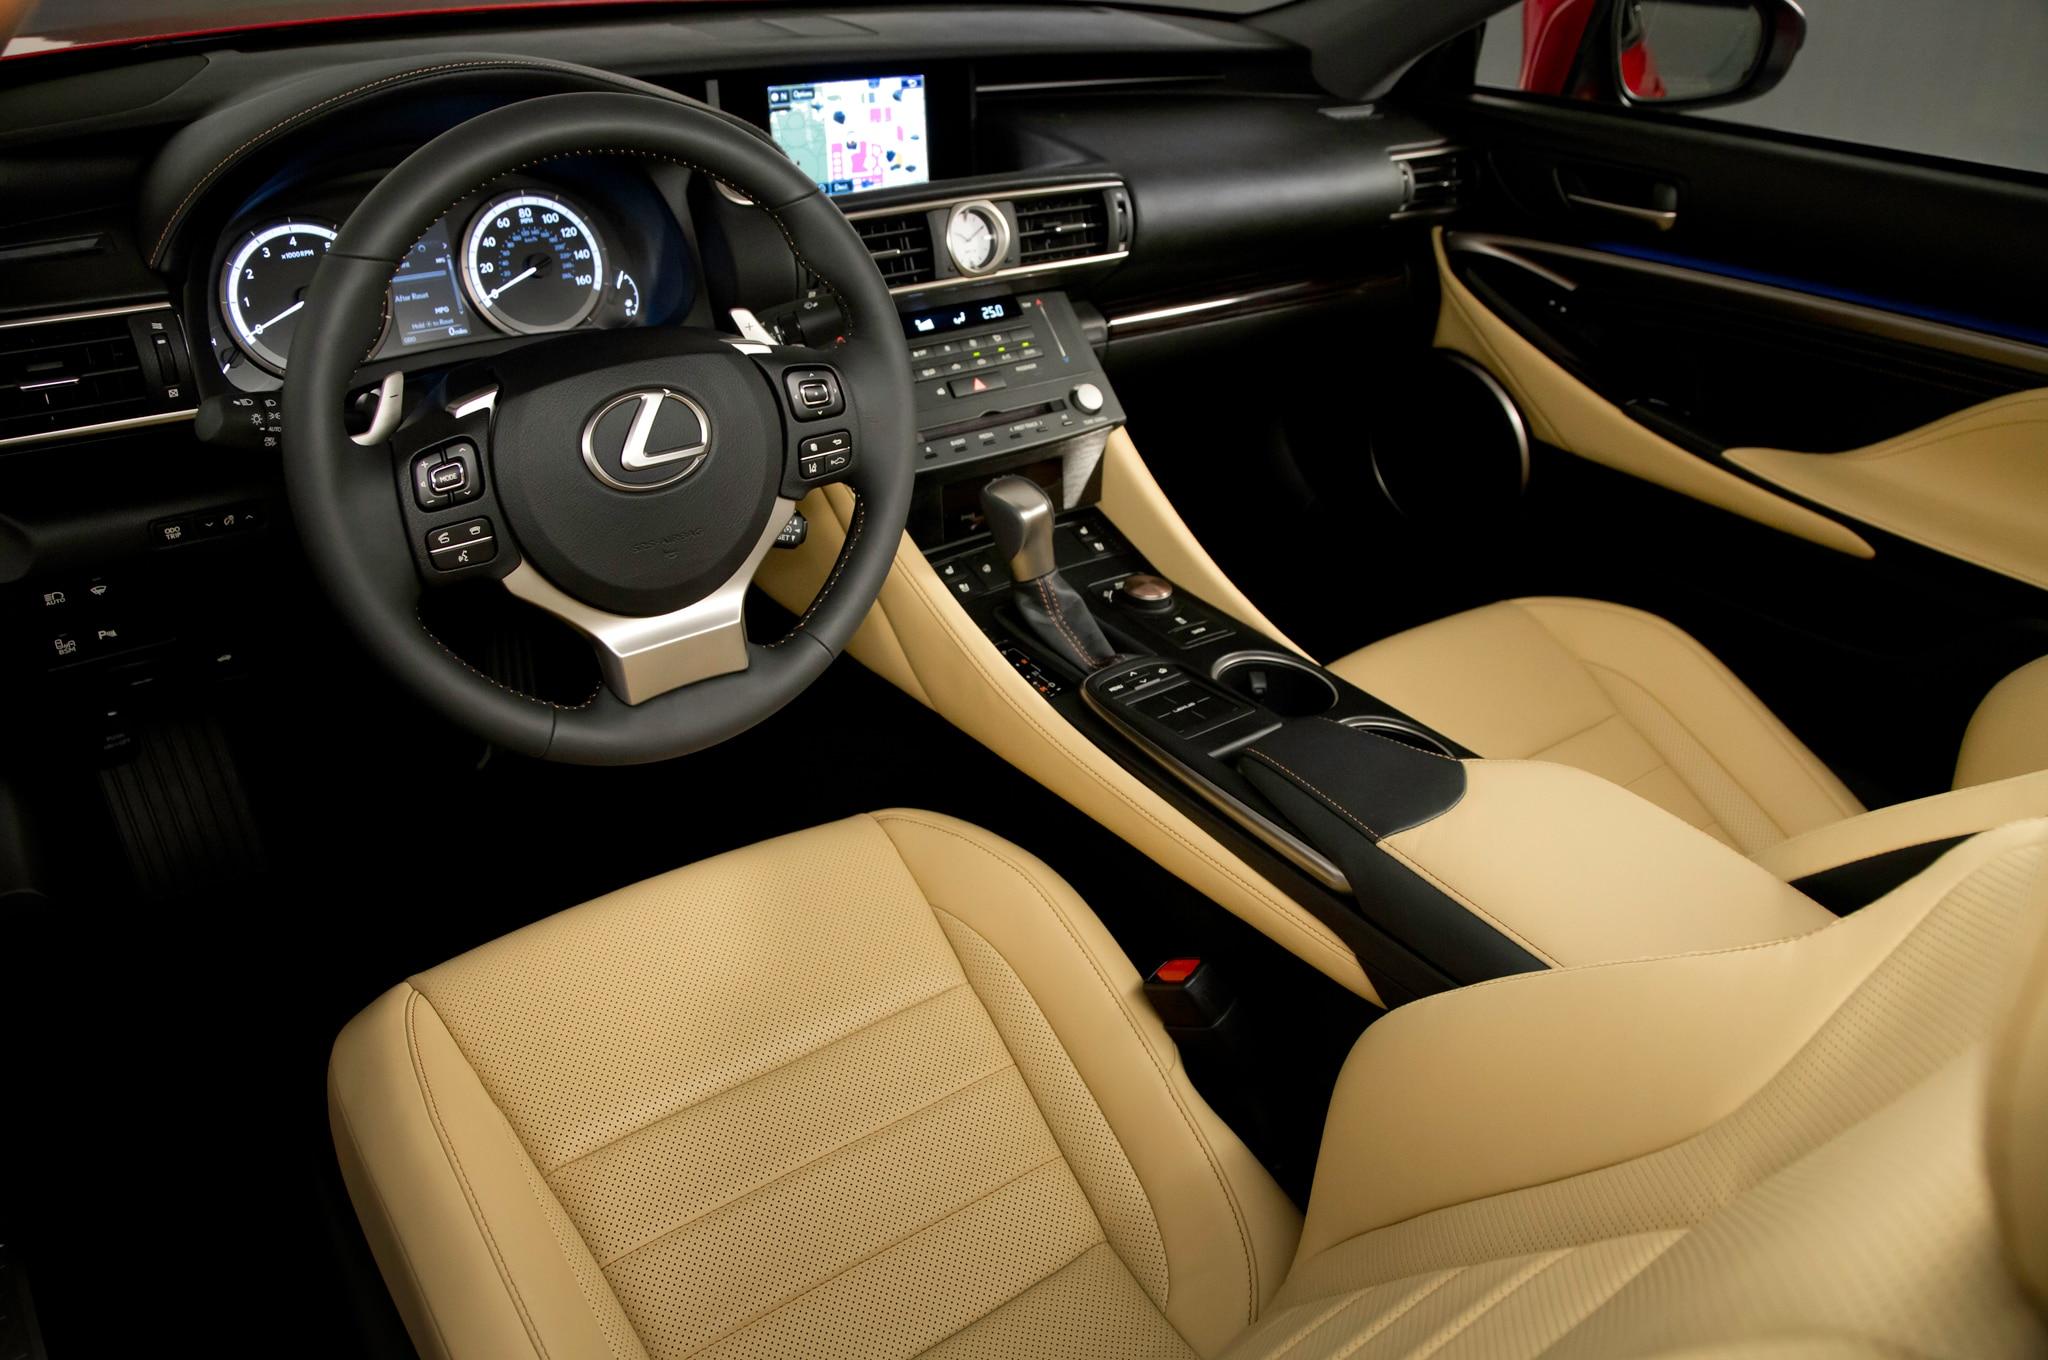 https://st.automobilemag.com/uploads/sites/11/2013/11/2015-Lexus-RC-dash.jpg